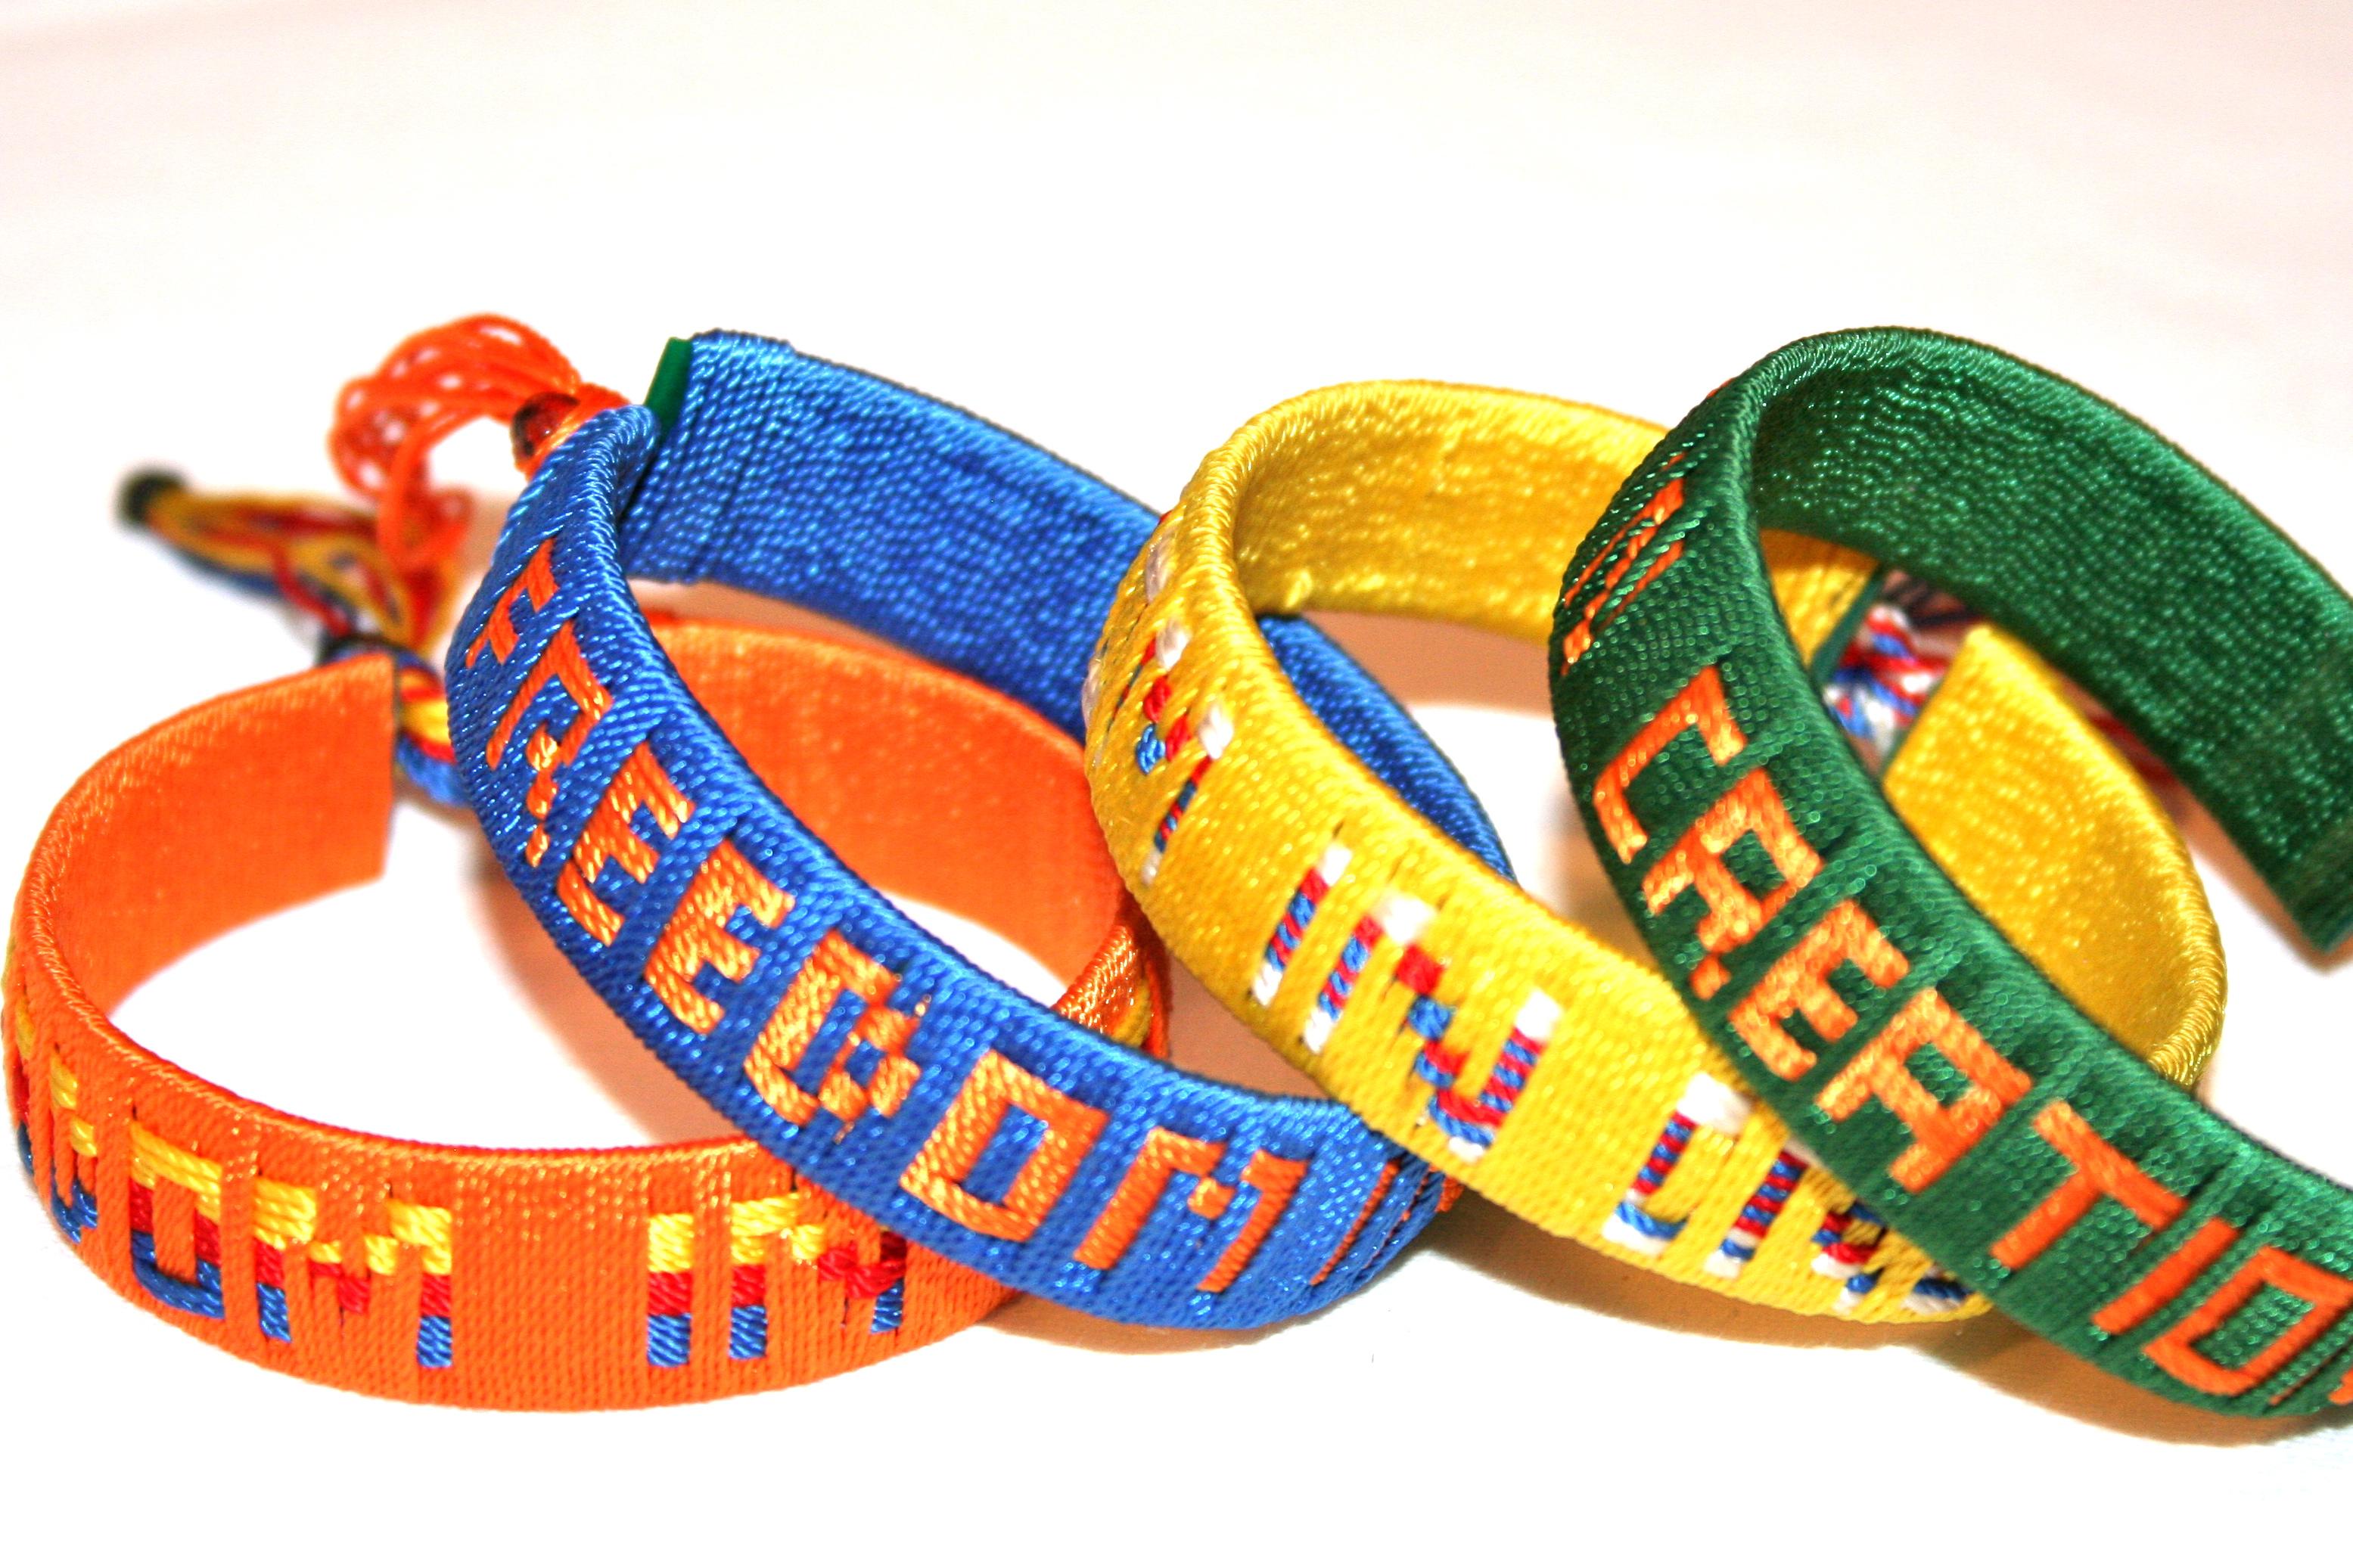 Woven Solidarity Bracelet